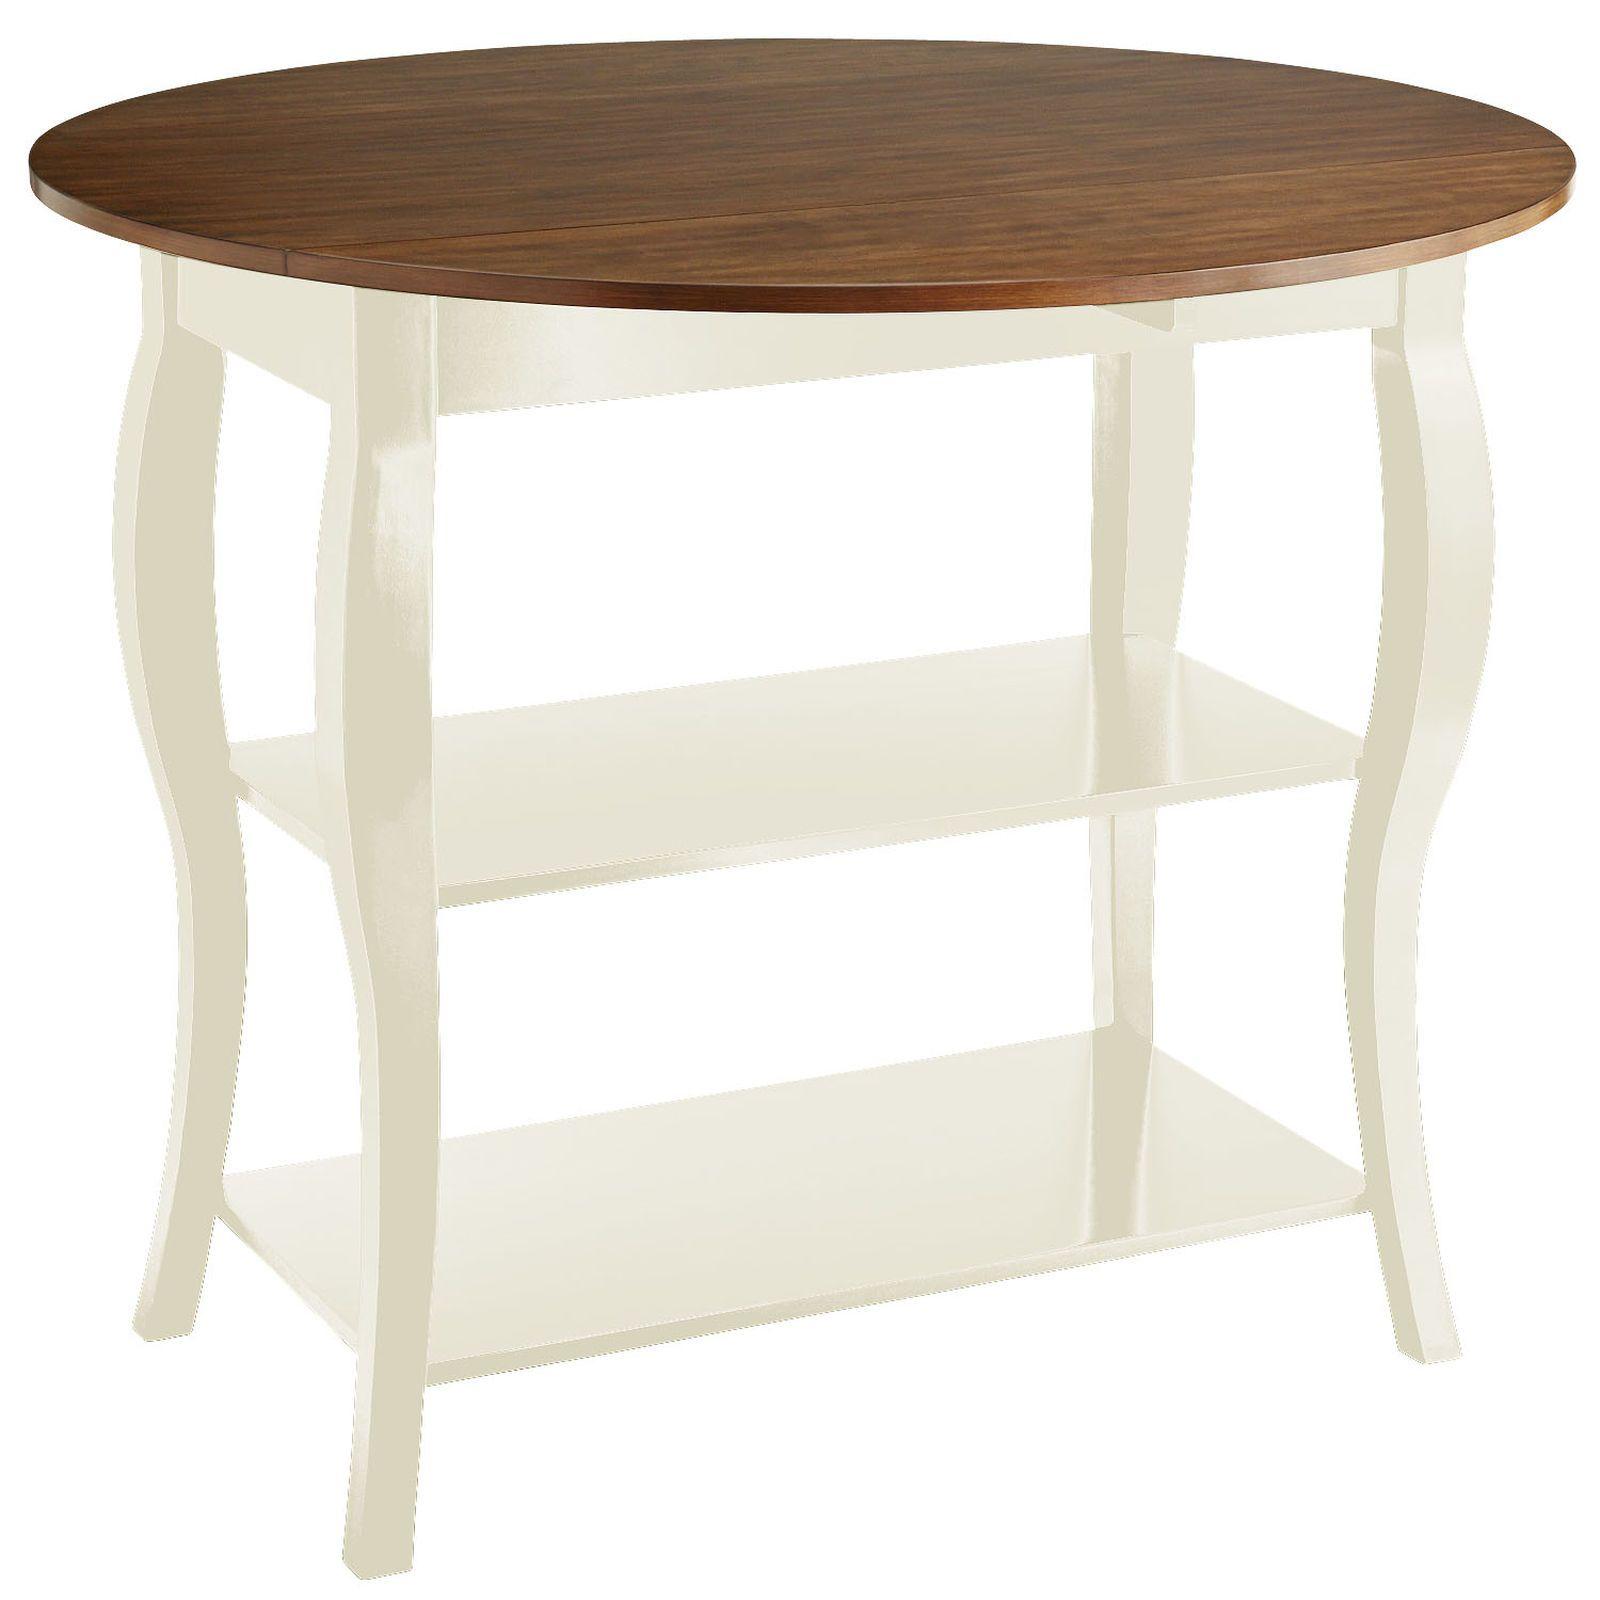 Enjoyable 250 00 3 Feet Tall Sides Fold Down Evonne Bar Table Machost Co Dining Chair Design Ideas Machostcouk